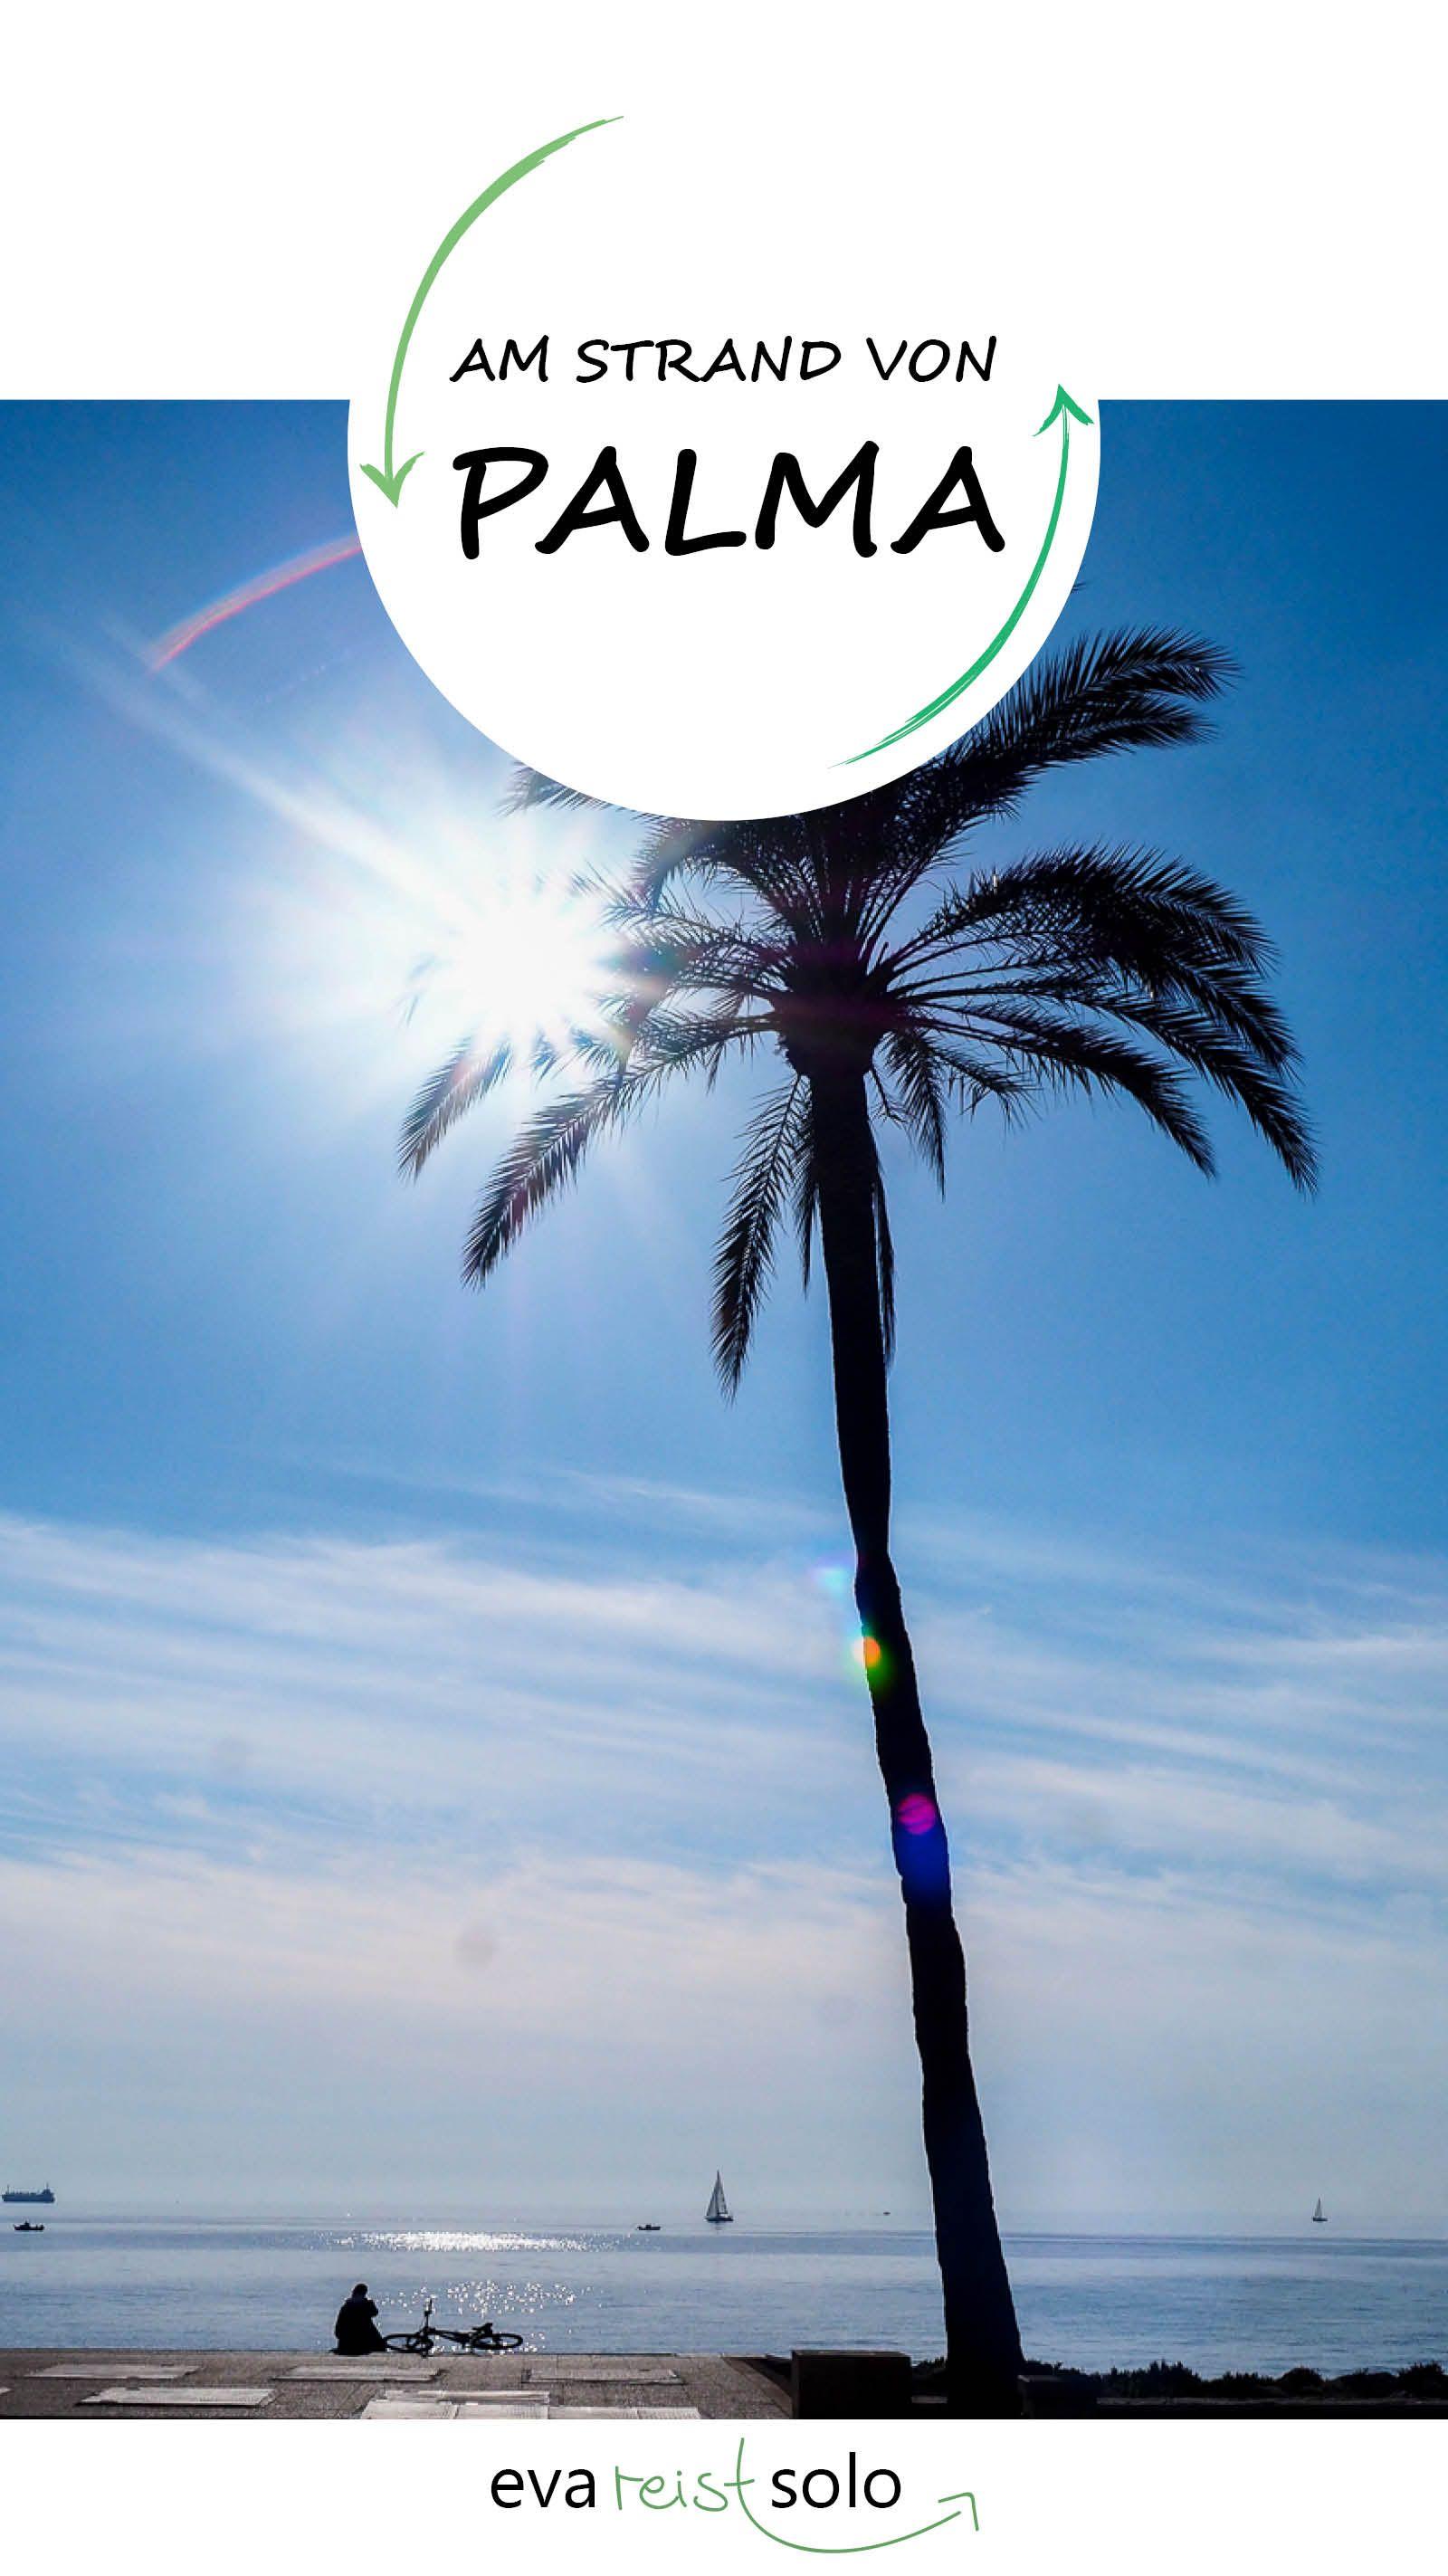 Mallorca Sehenswurdigkeiten Besondere Top 3 Mallorca Reisen